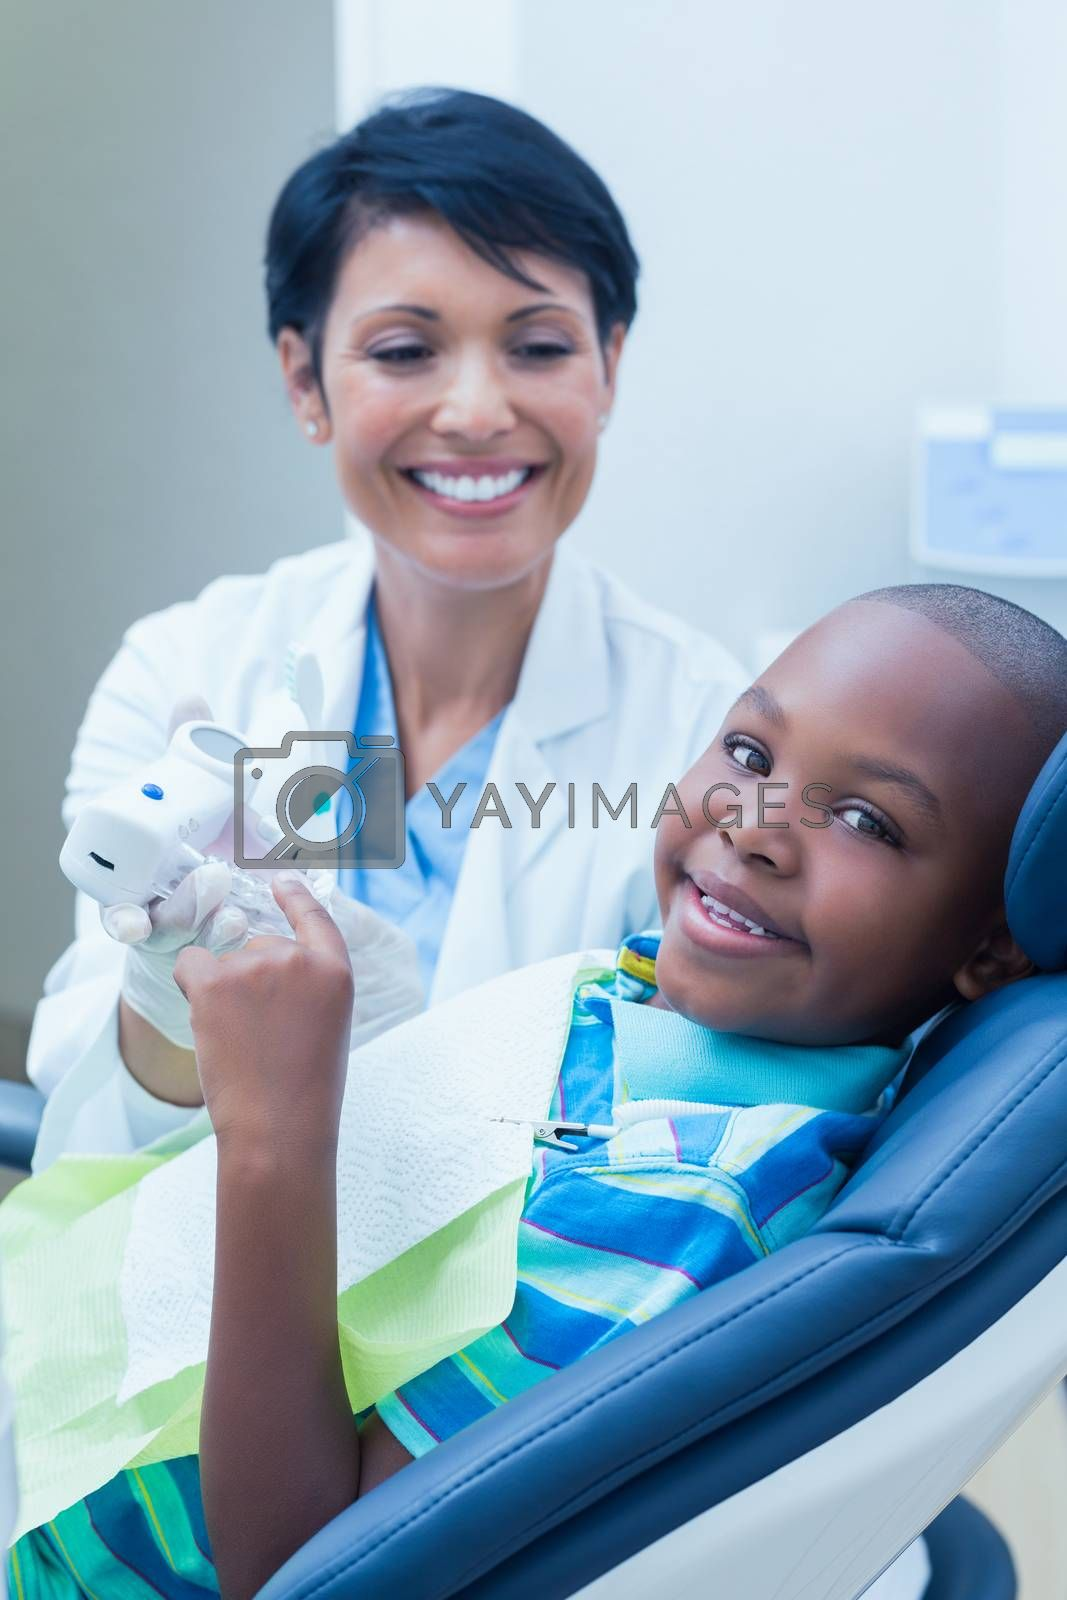 Portrait of smiling boy waiting for a dental exam